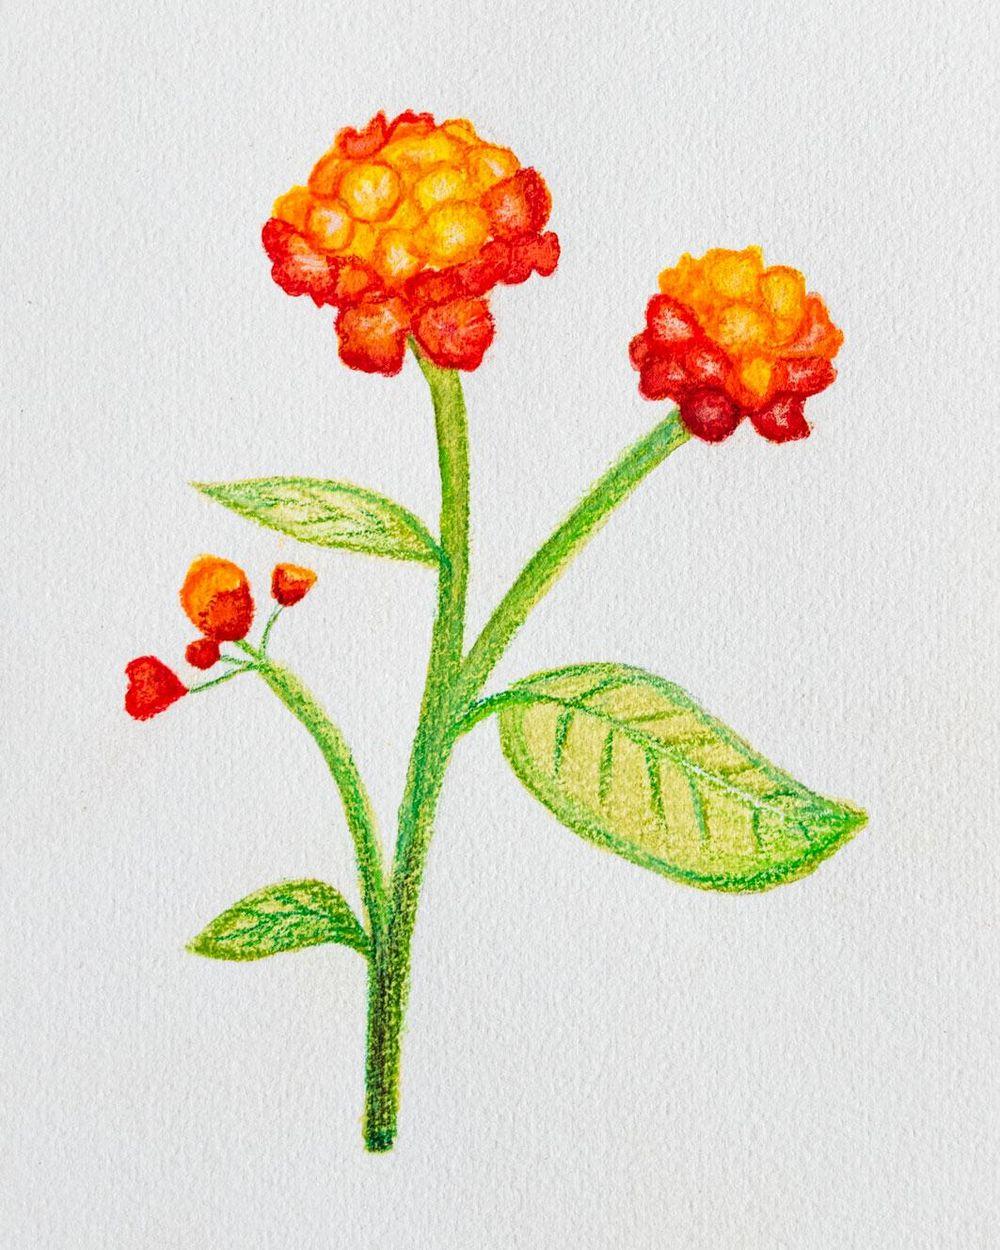 Lantana camara Flower - image 1 - student project